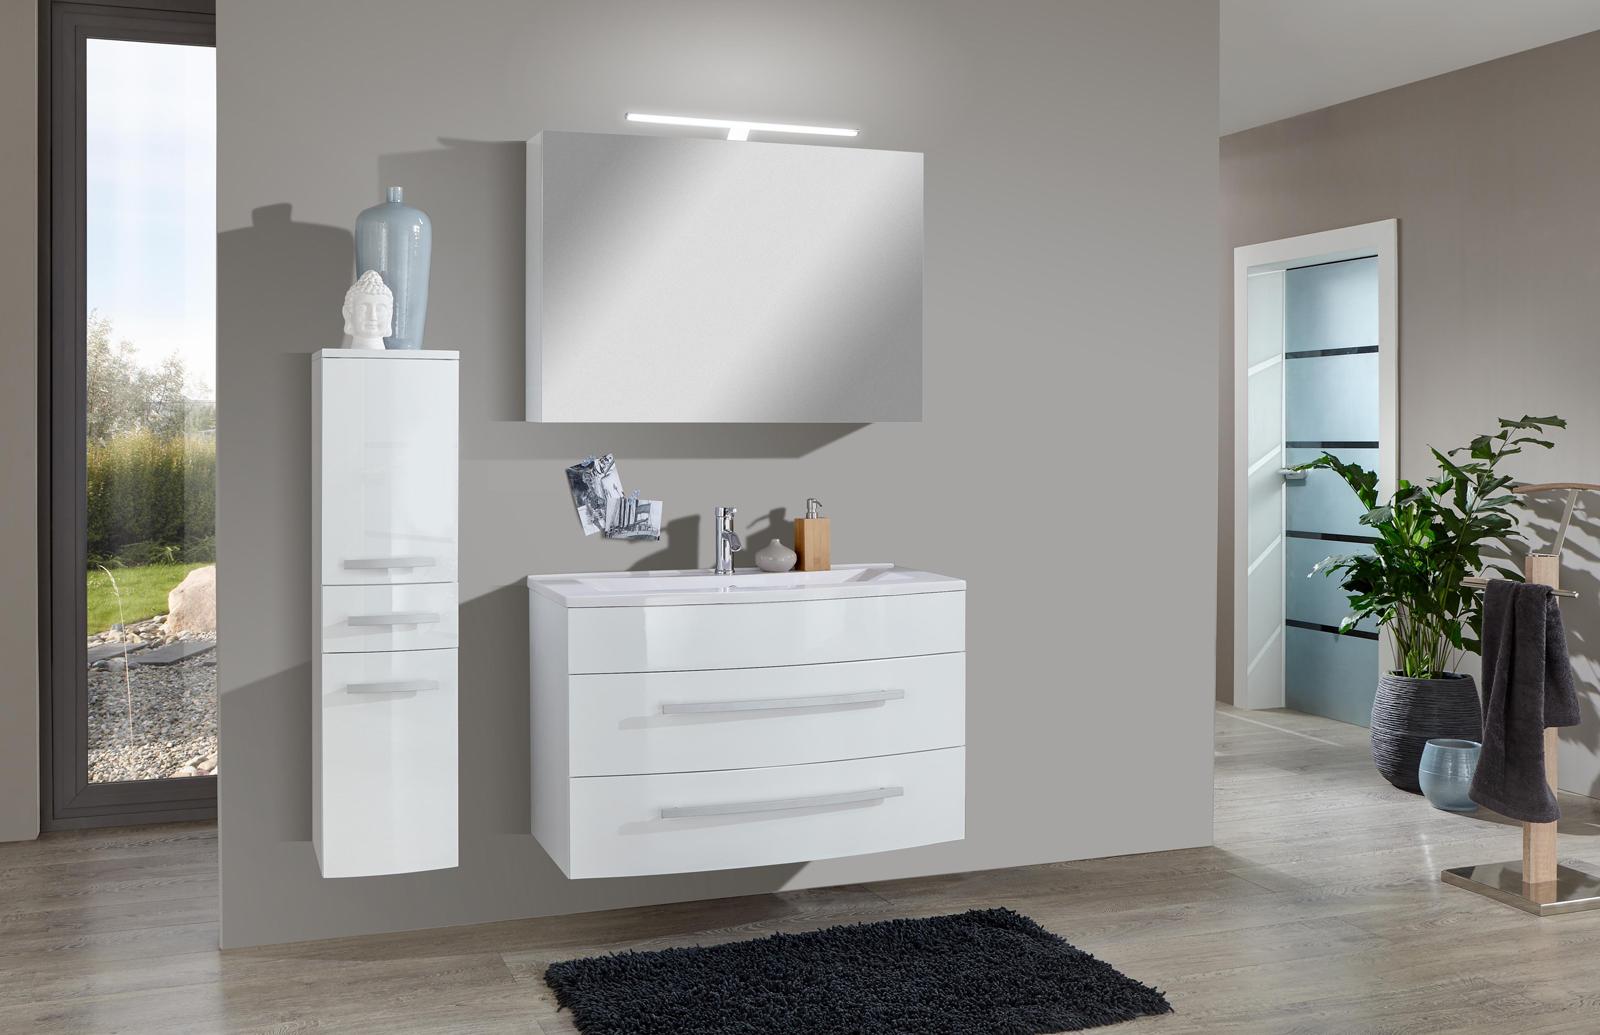 sam 3tlg badezimmer set hochglanz wei 90cm genf deluxe. Black Bedroom Furniture Sets. Home Design Ideas